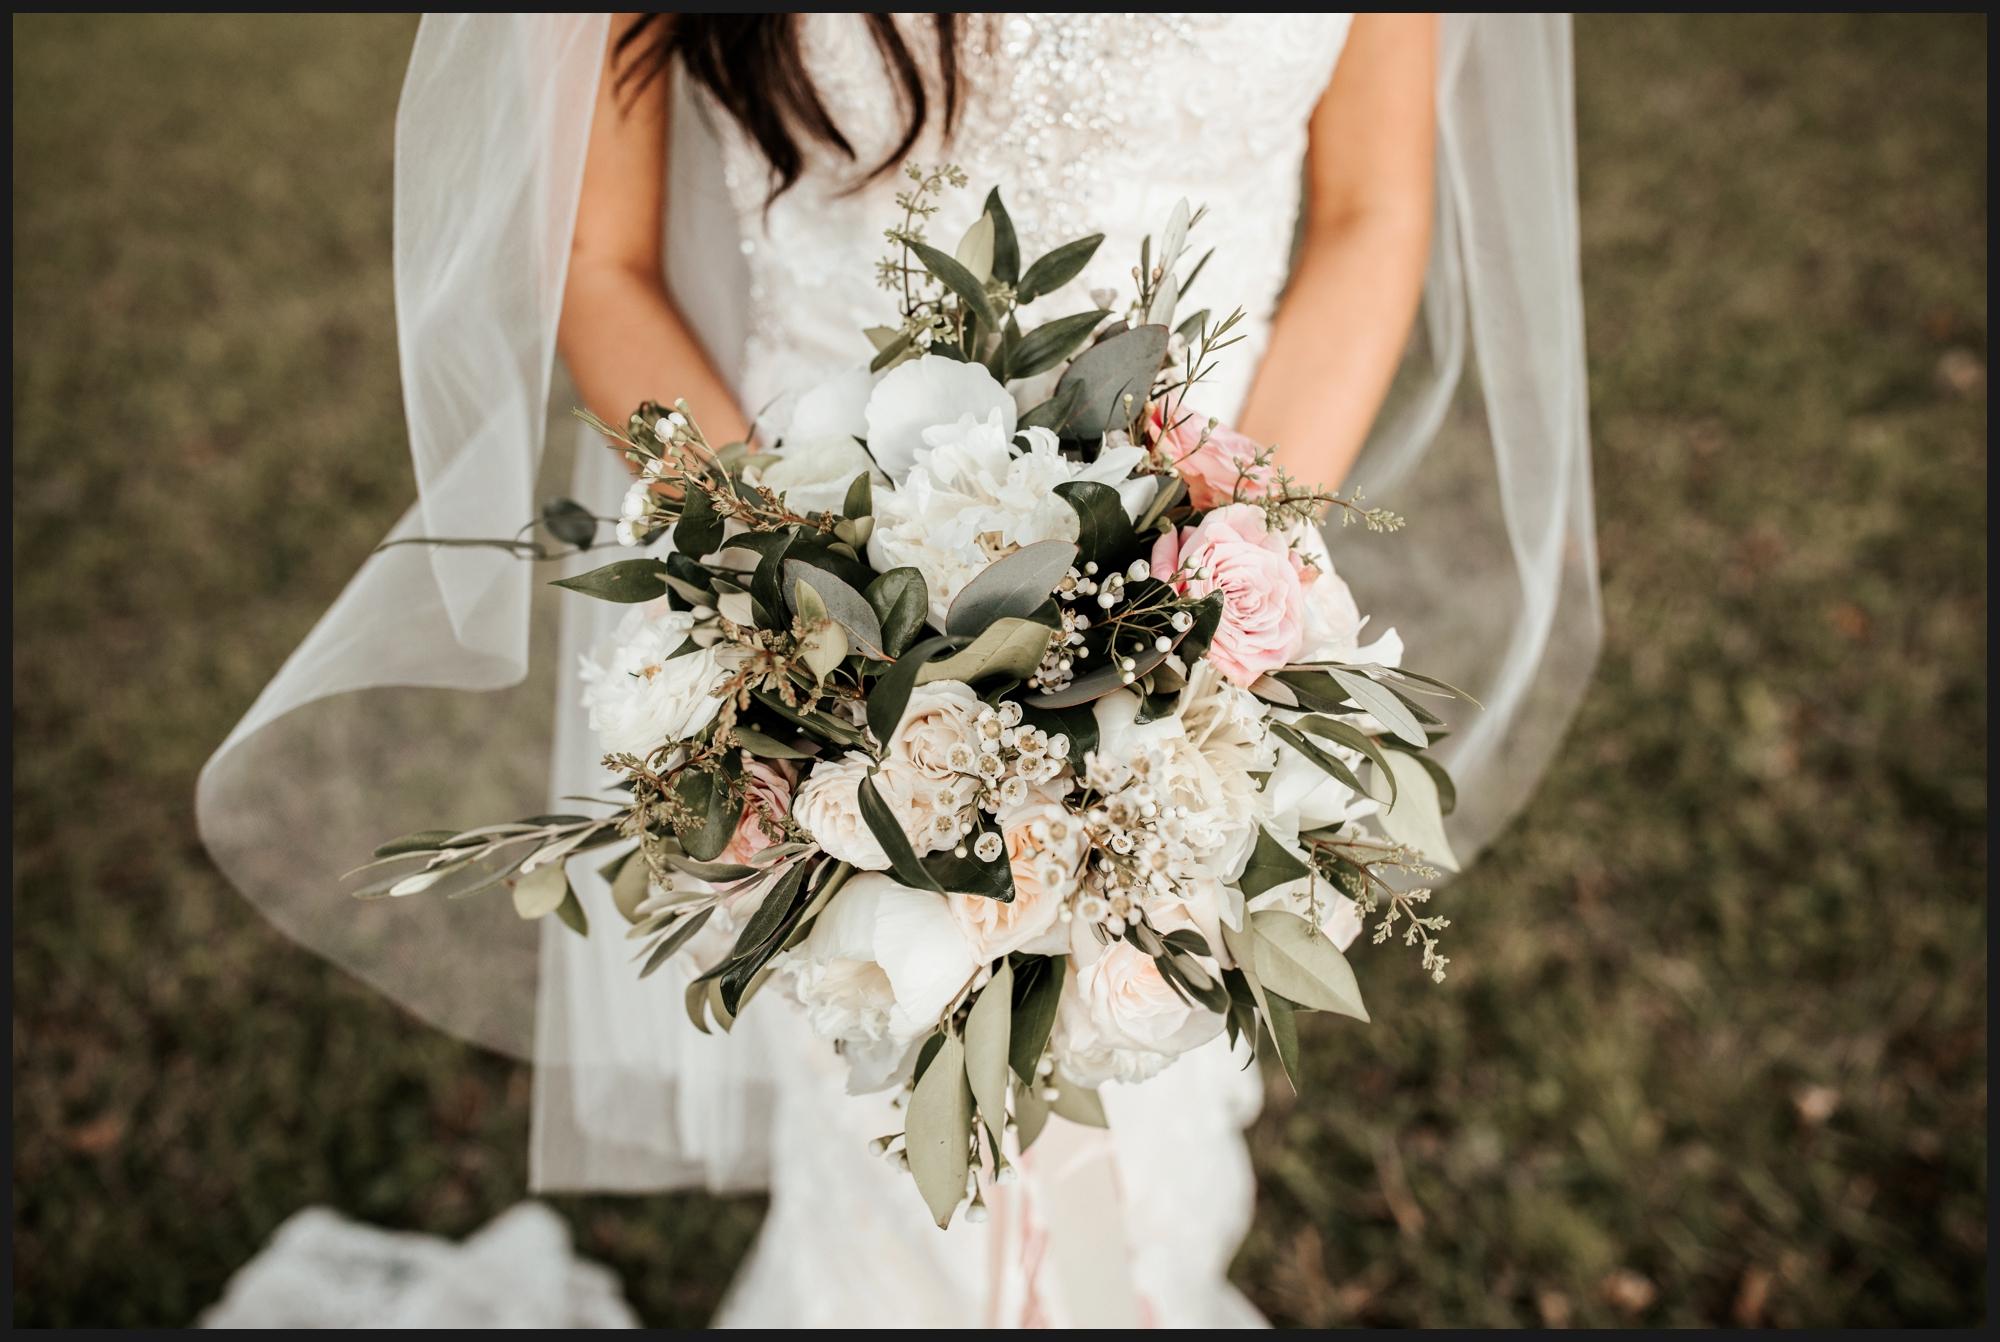 Orlando-Wedding-Photographer-destination-wedding-photographer-florida-wedding-photographer-bohemian-wedding-photographer_1443.jpg